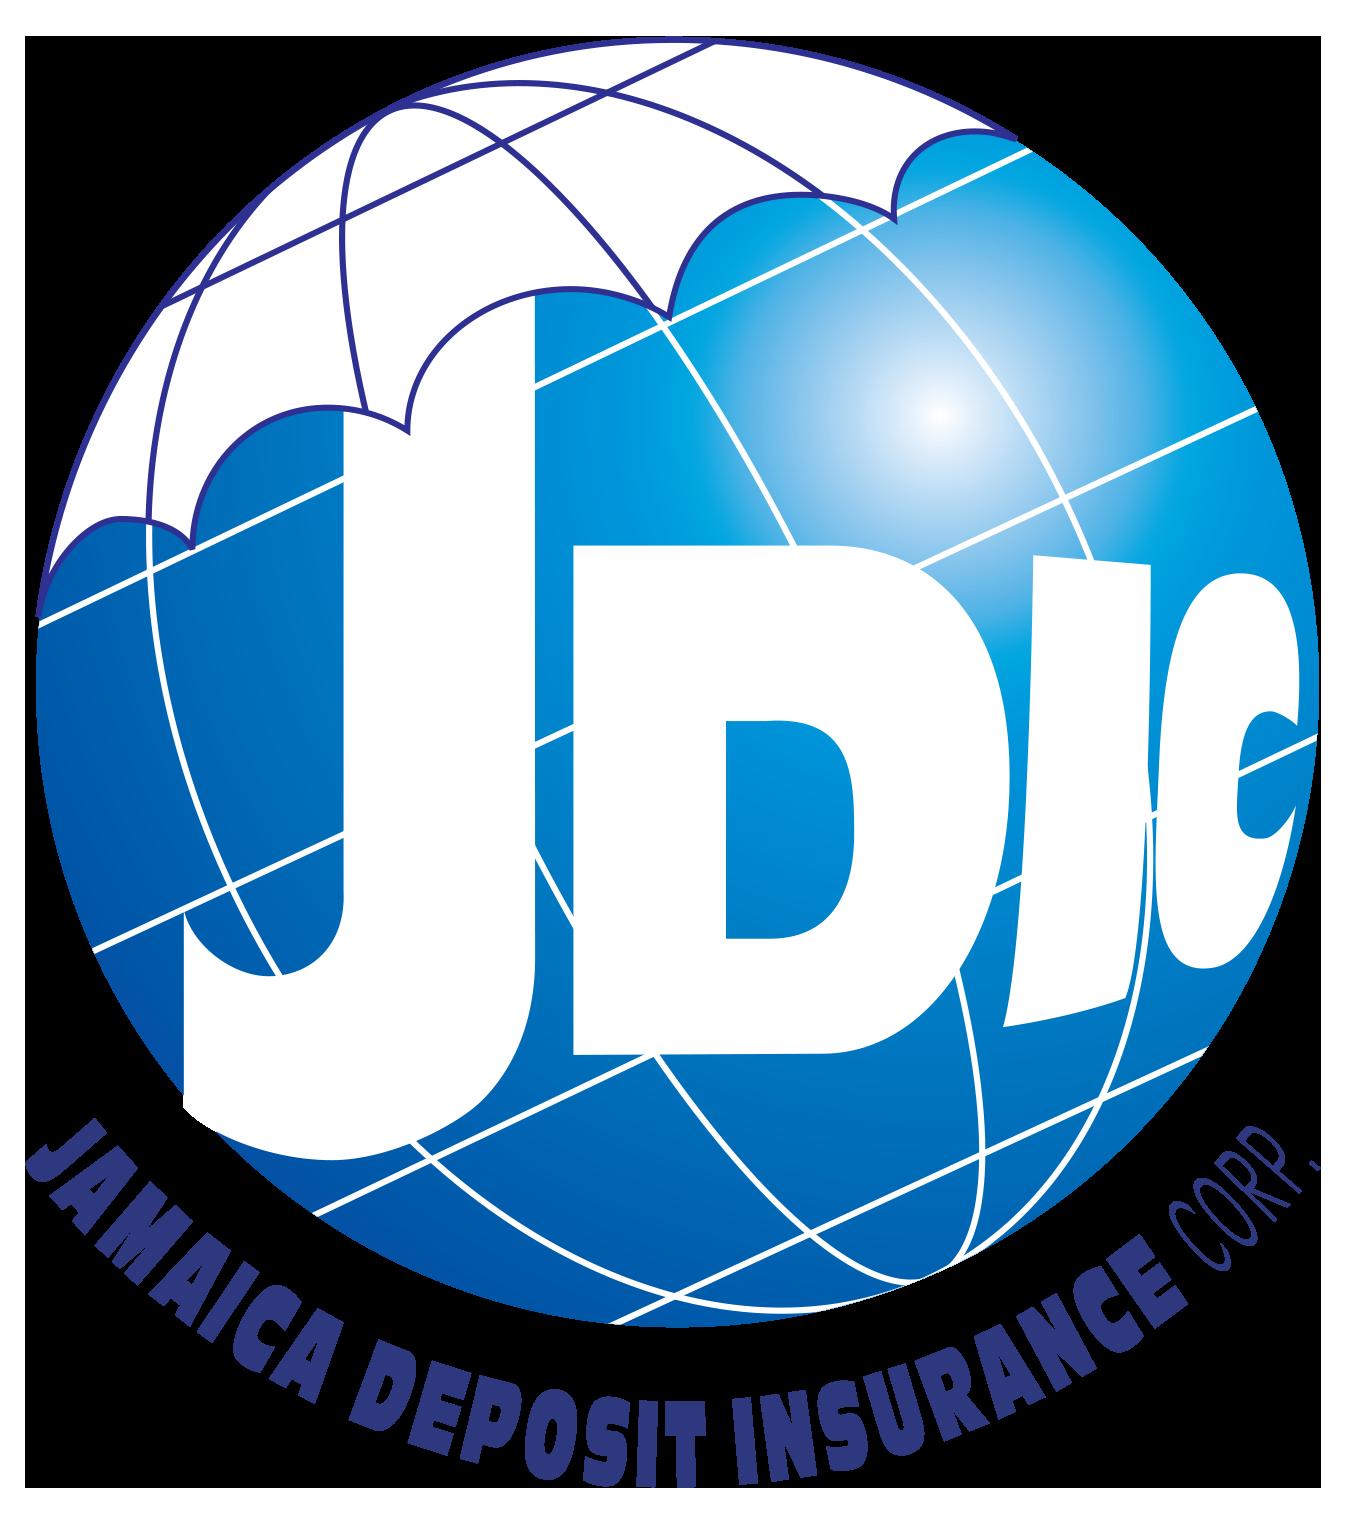 Jamaica Deposit Insurance Corporation